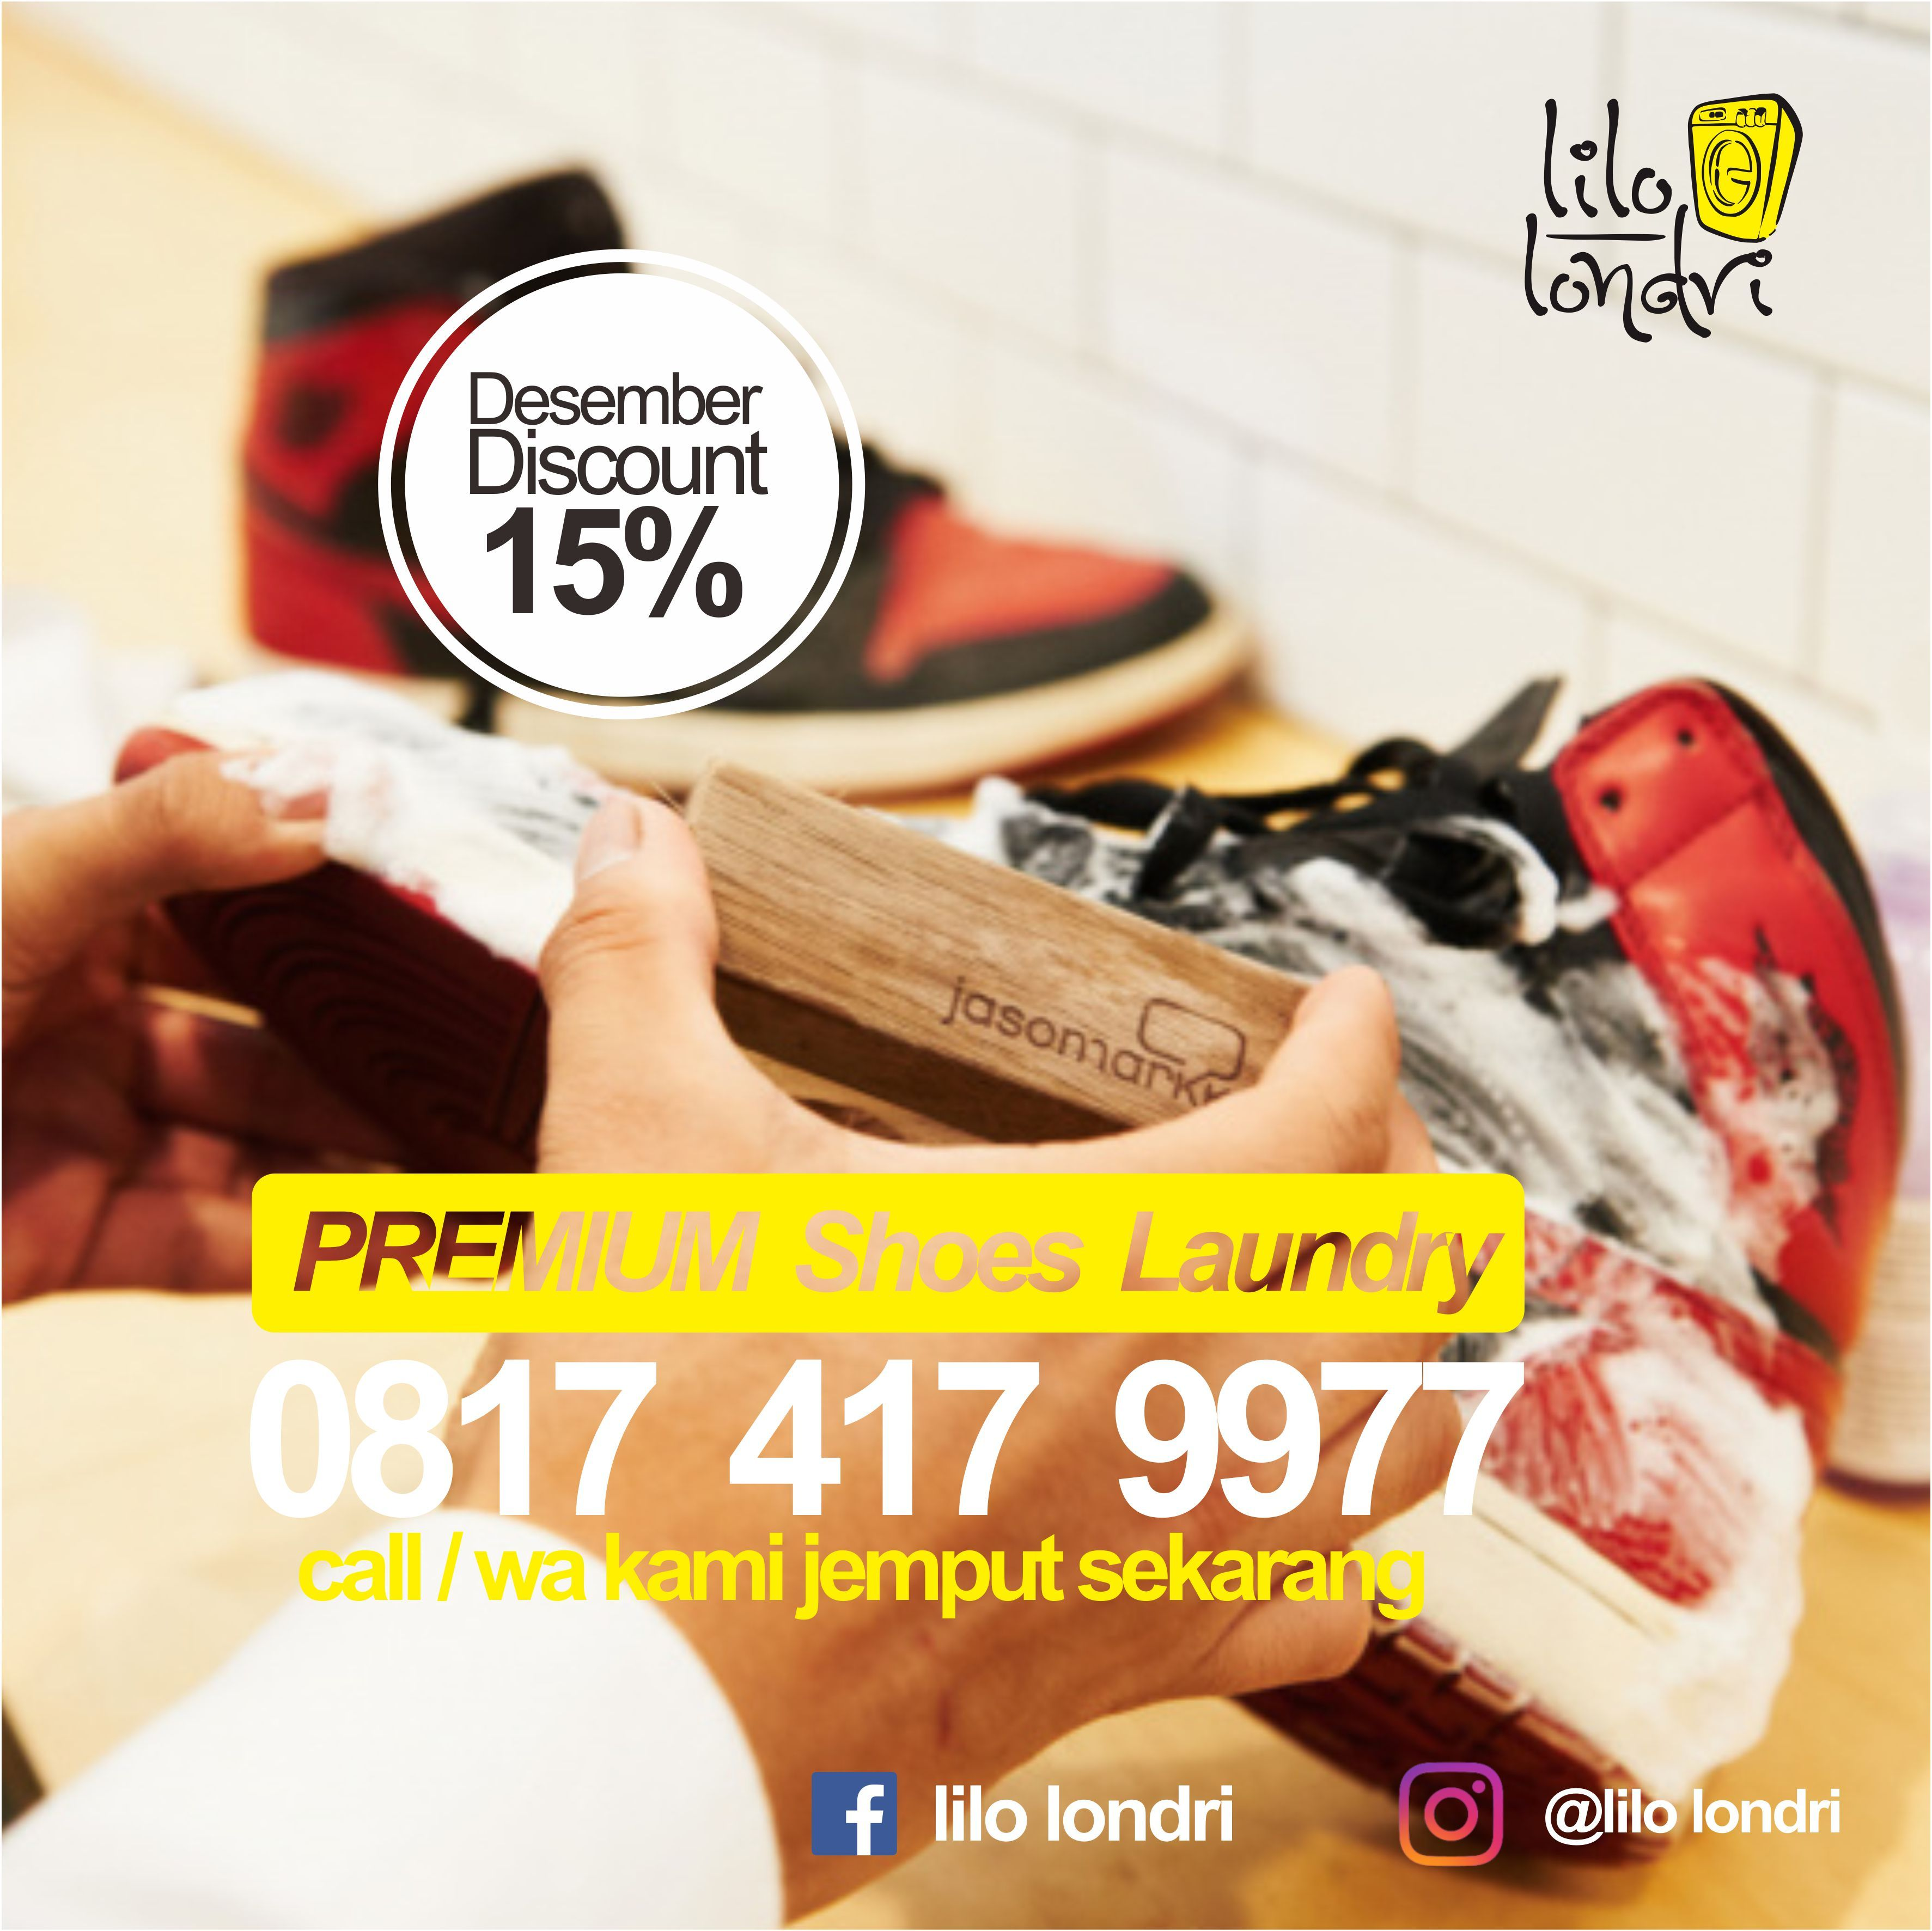 Permalink to Sepatu Running Specs Free Ongkir